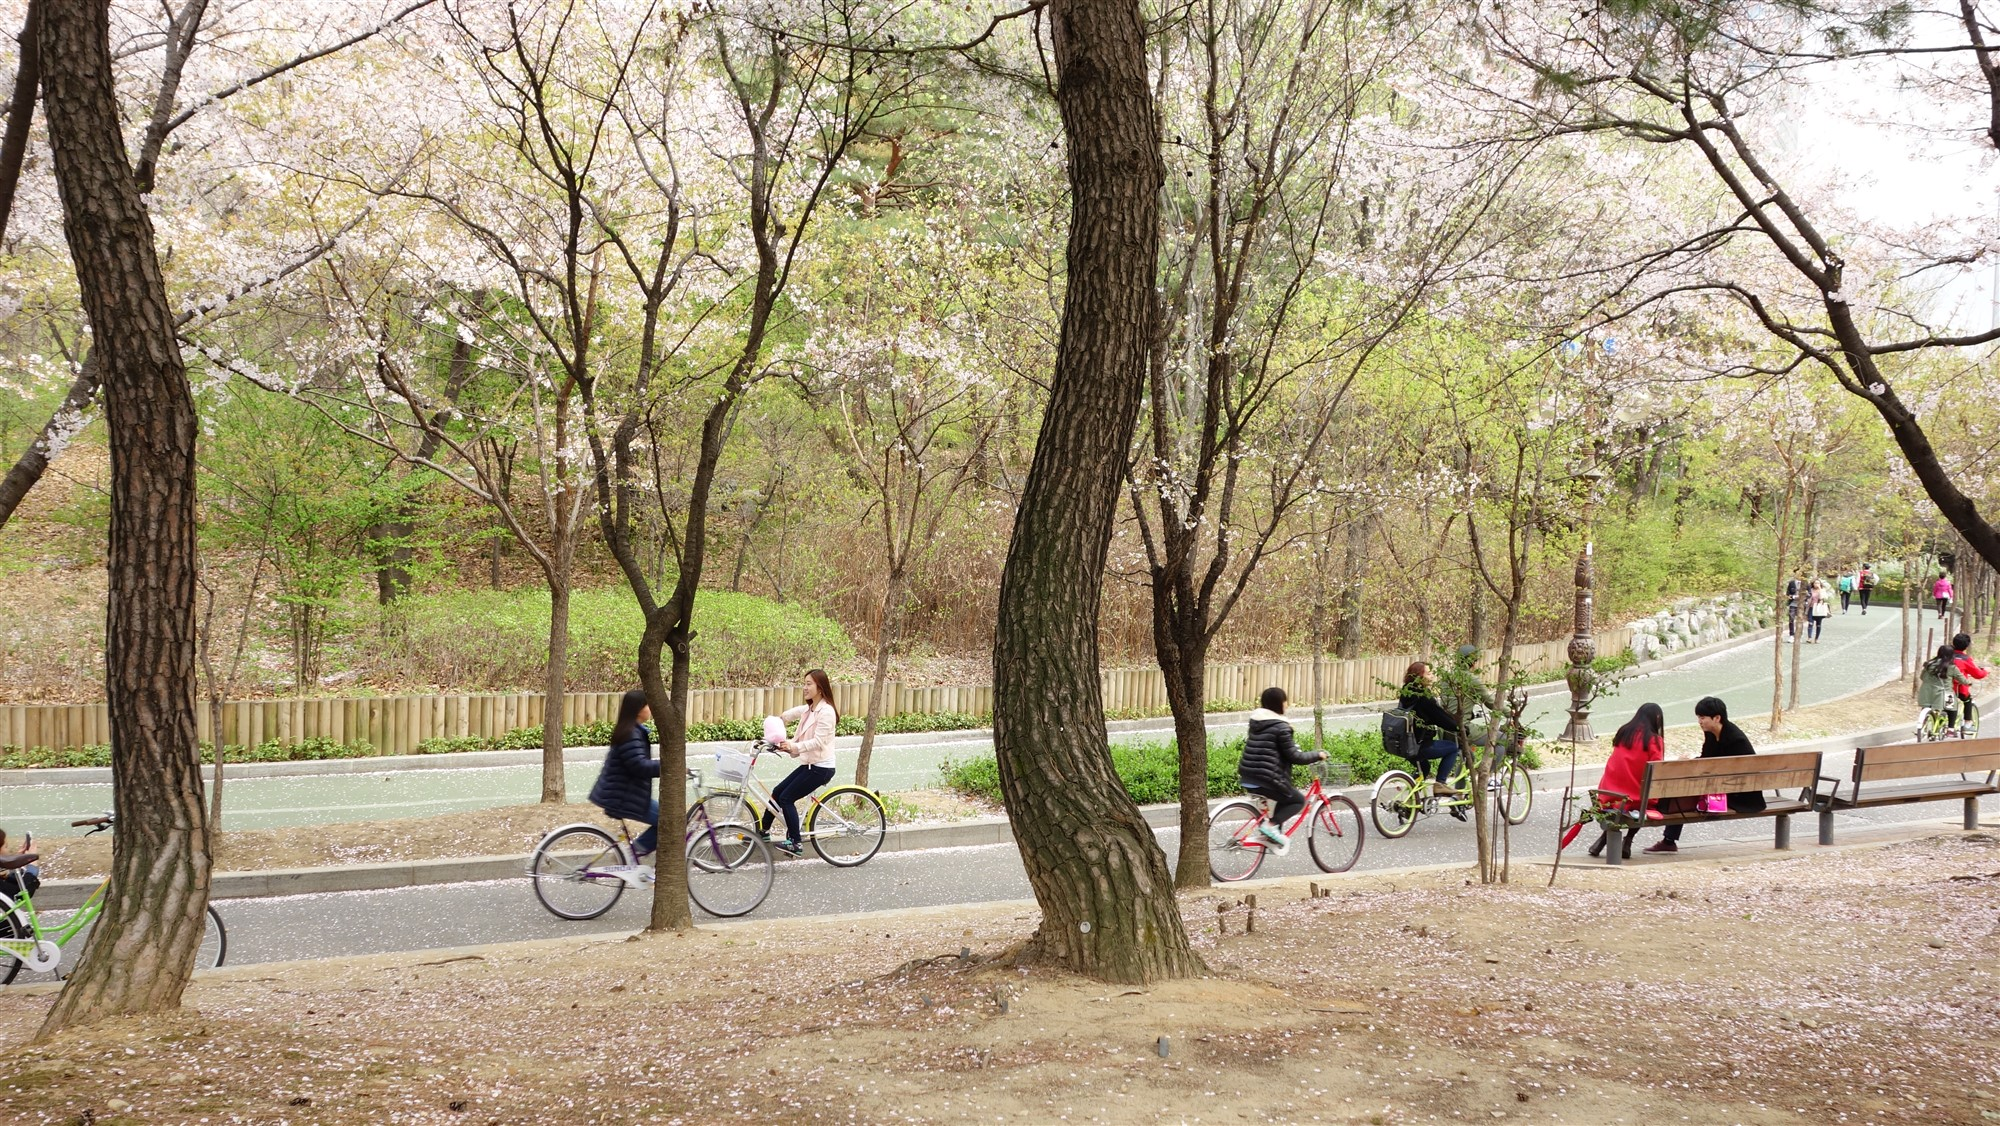 Yeouido_Park_Bicycles,_Seoul.jpg